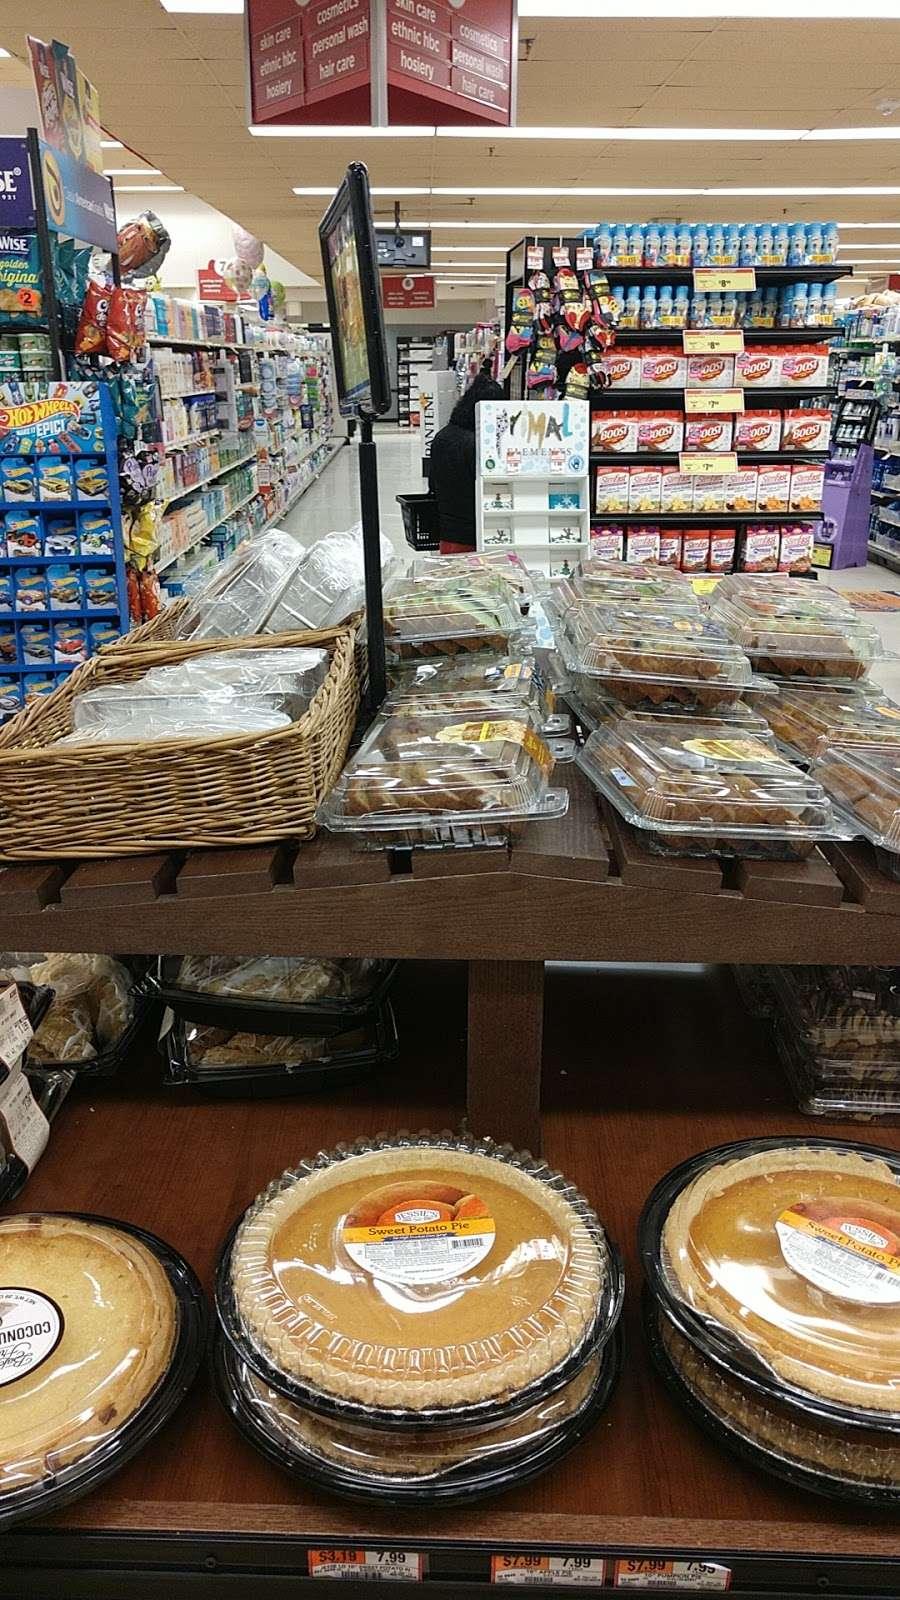 ACME Markets - store  | Photo 2 of 10 | Address: 321 NJ-440, Jersey City, NJ 07305, USA | Phone: (201) 946-2525